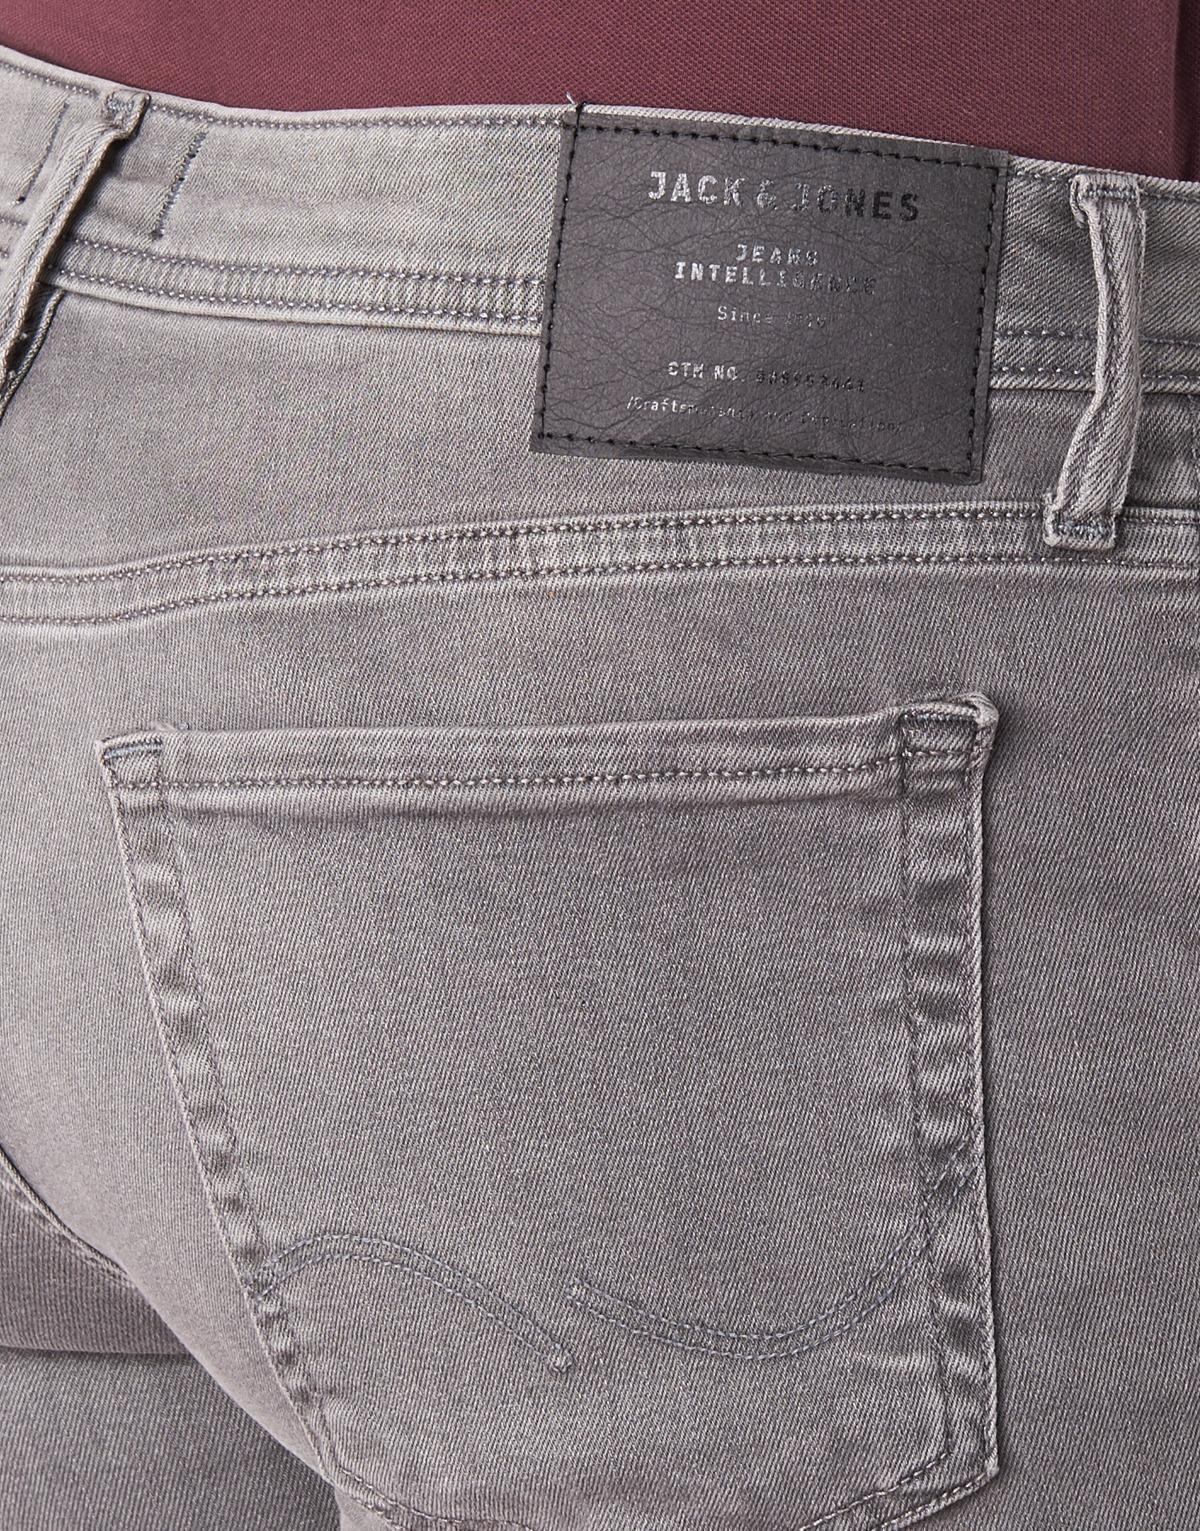 Jack & Jones Denim Jack Jones Slim Fit Jeans LIAM in Grau für Herren Rc9QA